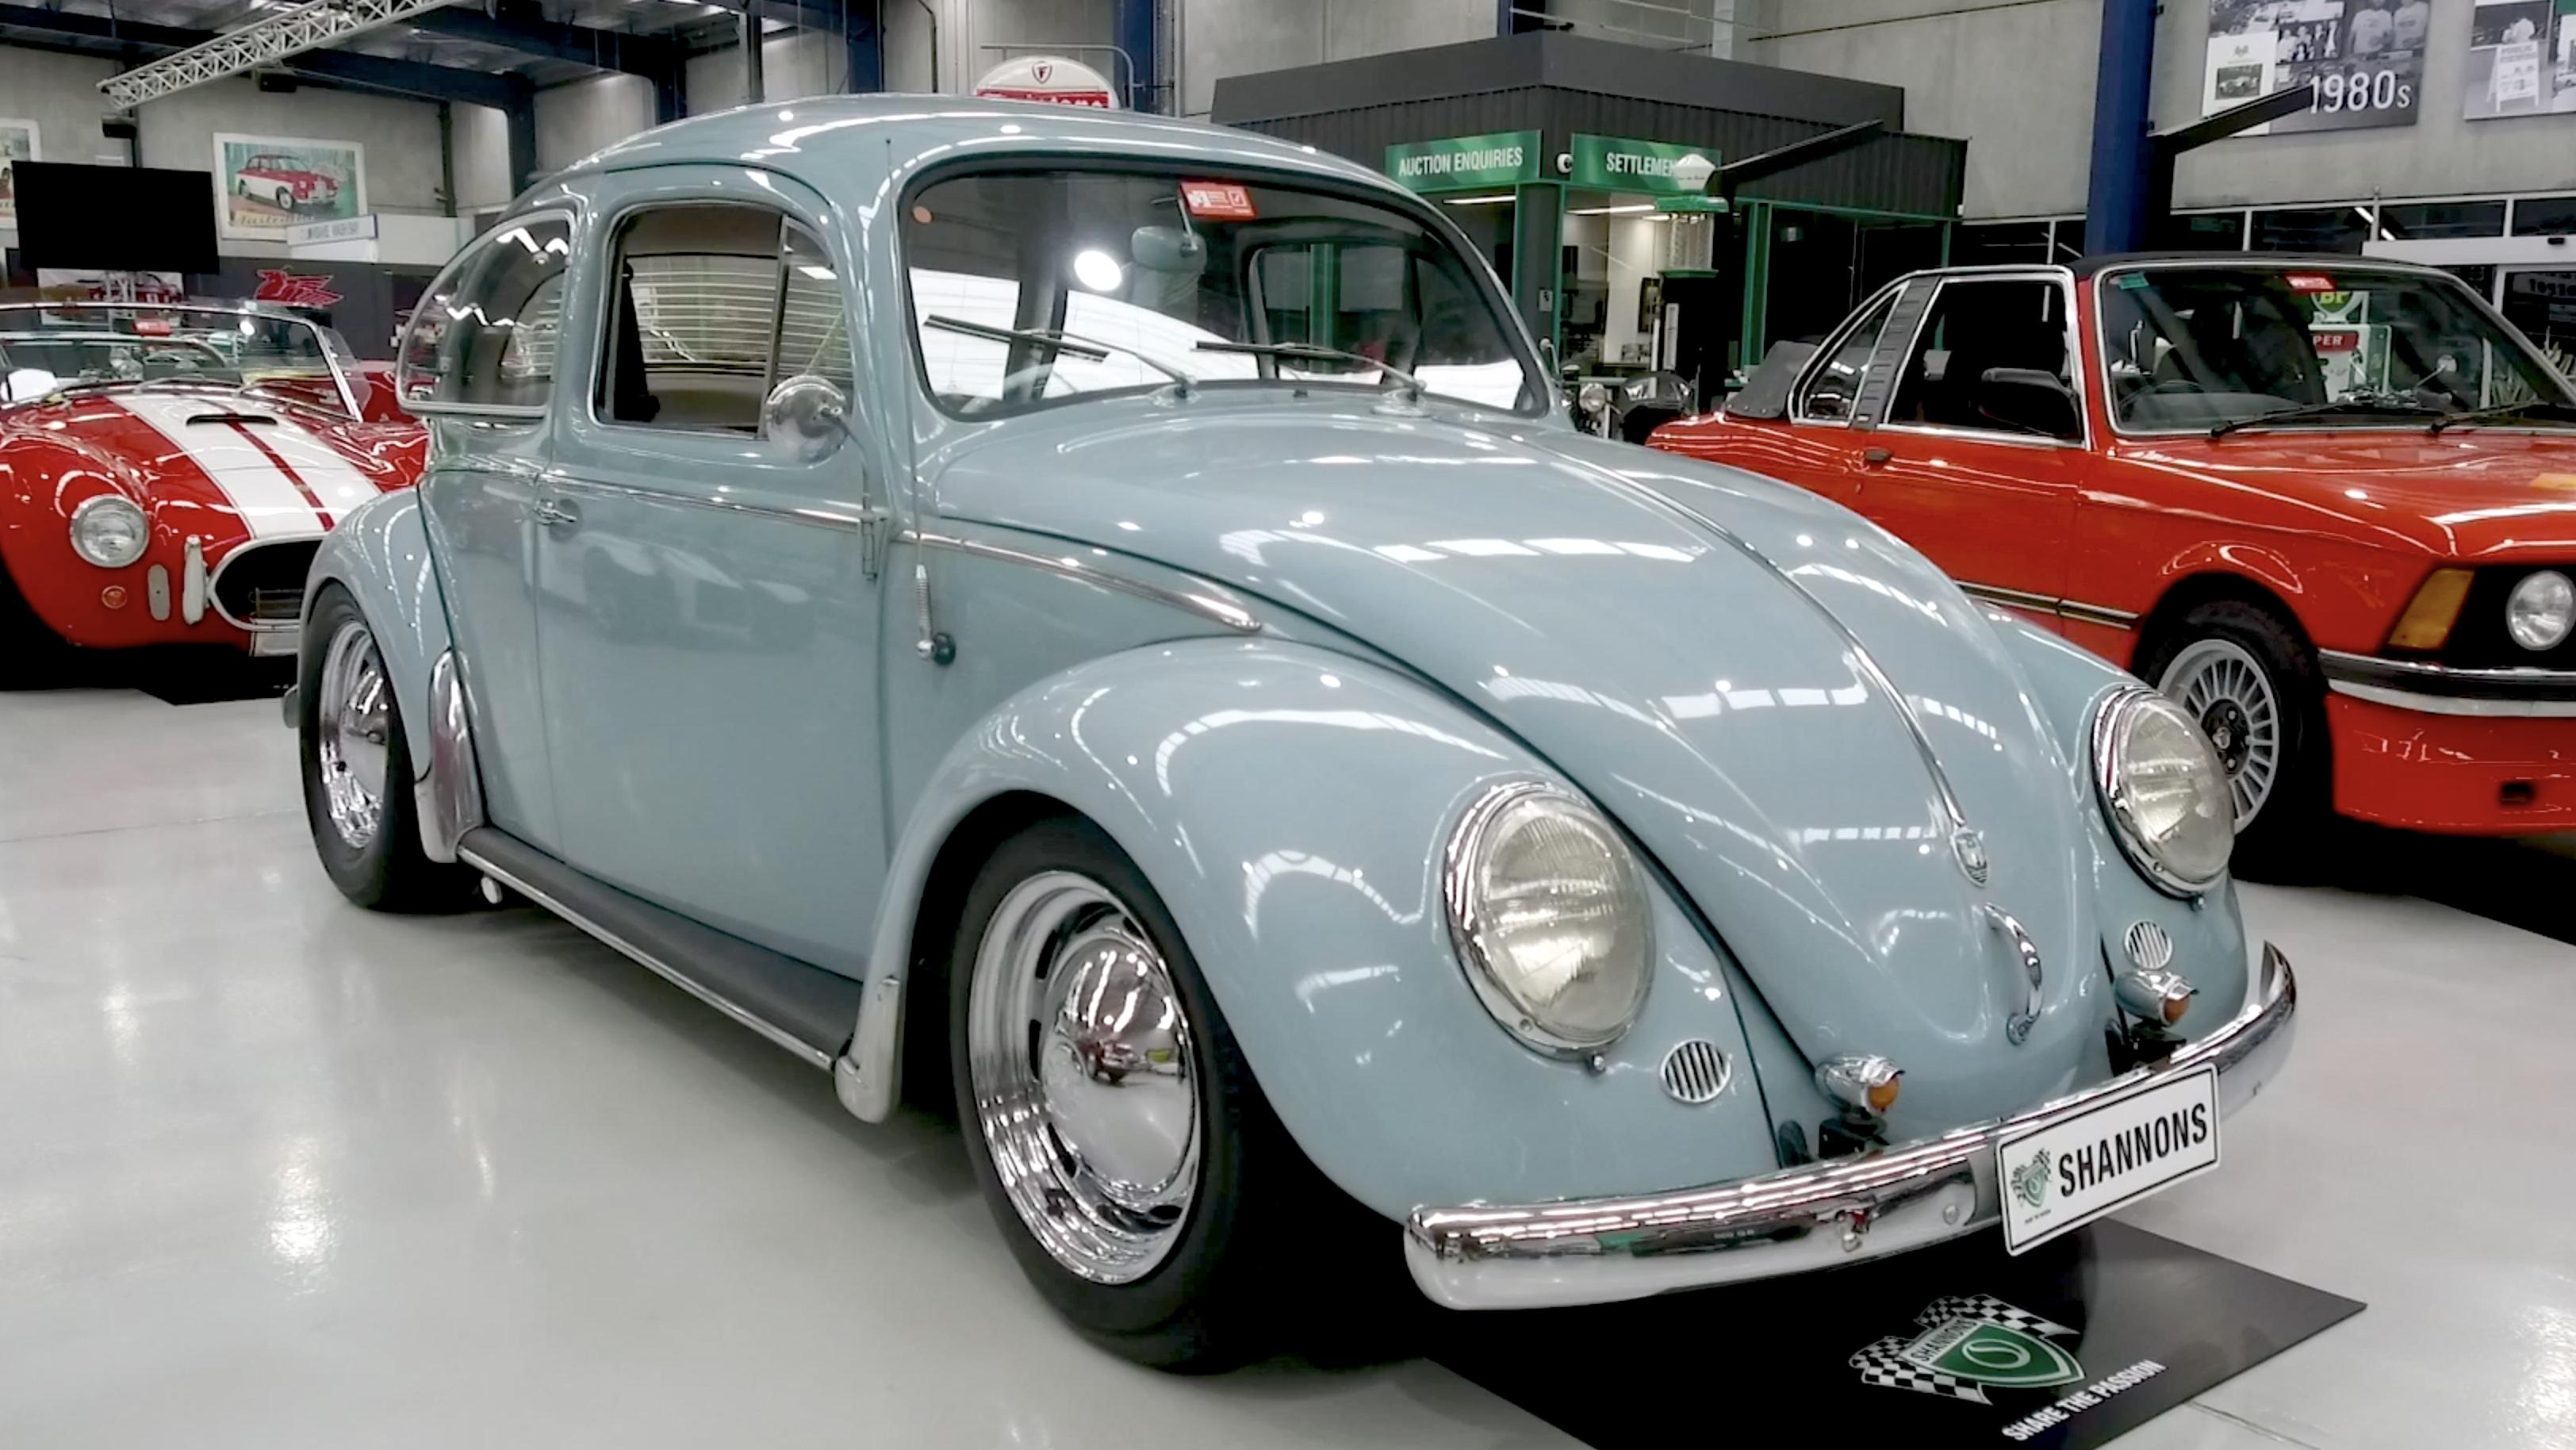 1958 Volkswagen Beetle 1600 'Enhanced' Sedan - 2020 Shannons Spring Timed Online Auction